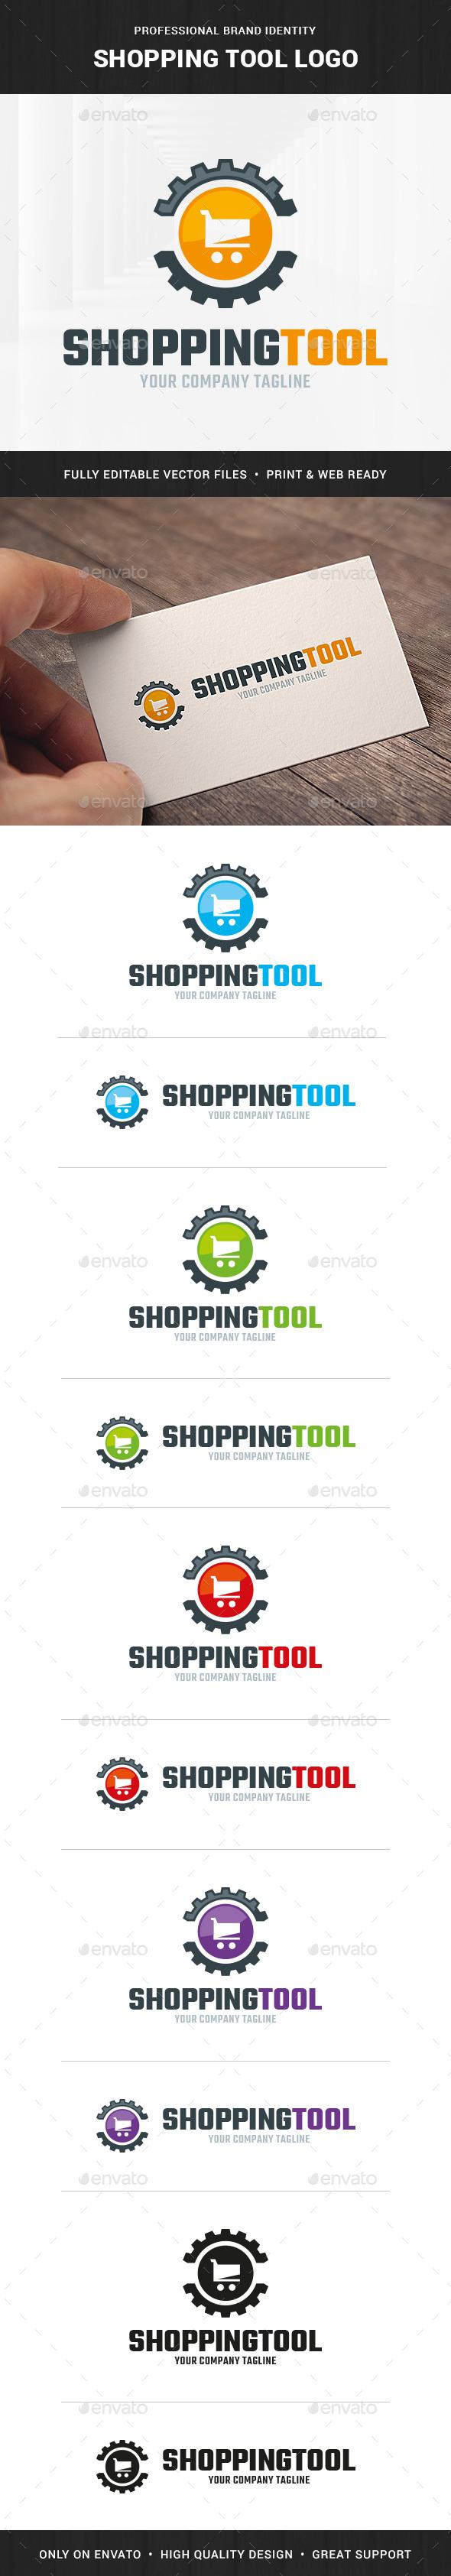 Shopping Tool Logo Template